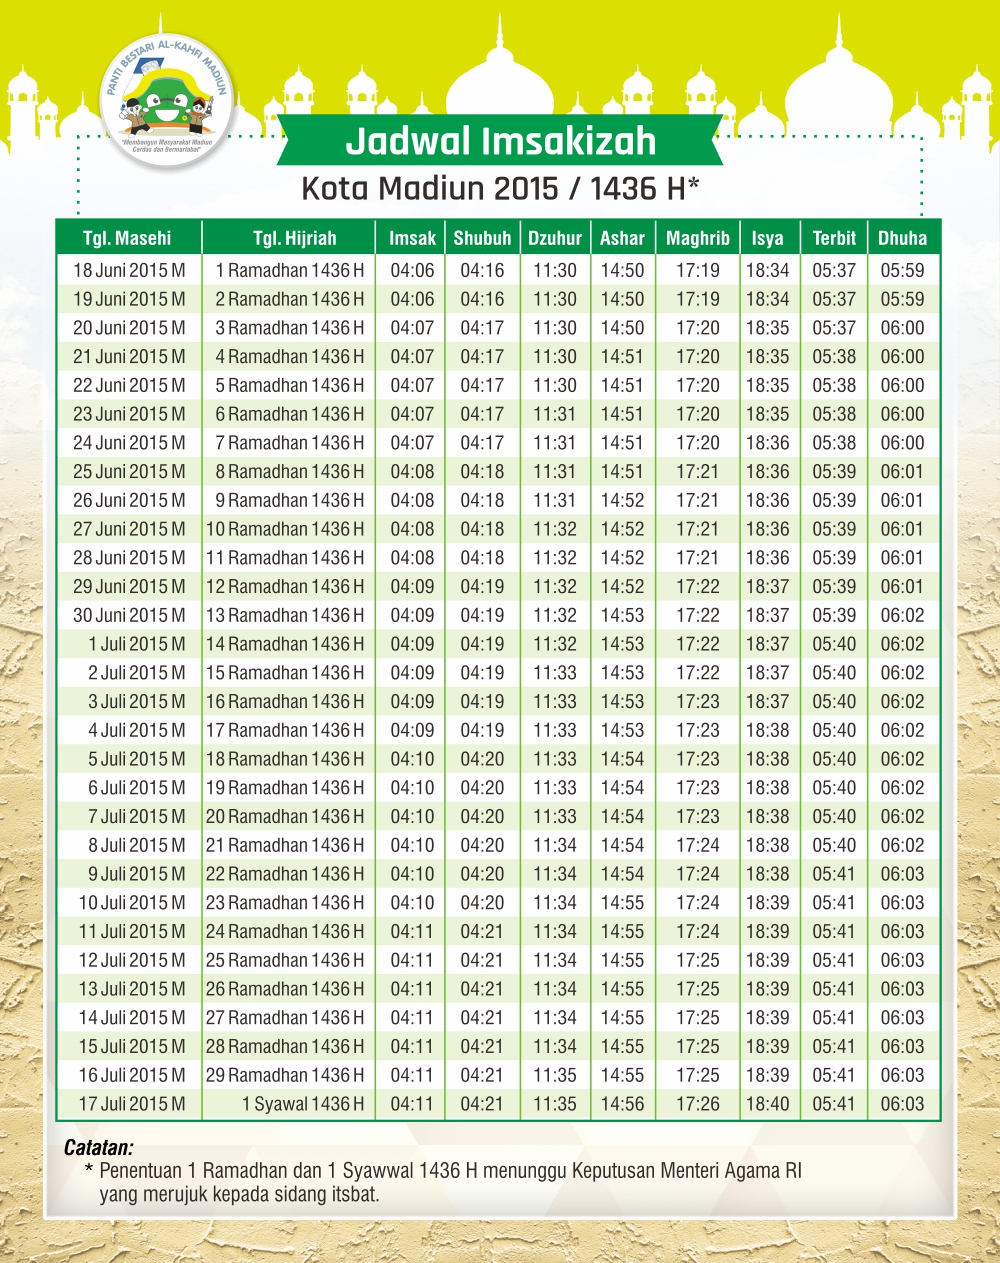 Jadwal Imsakiyah Kota Madiun 2015 / 1436 H Editable Vector ...